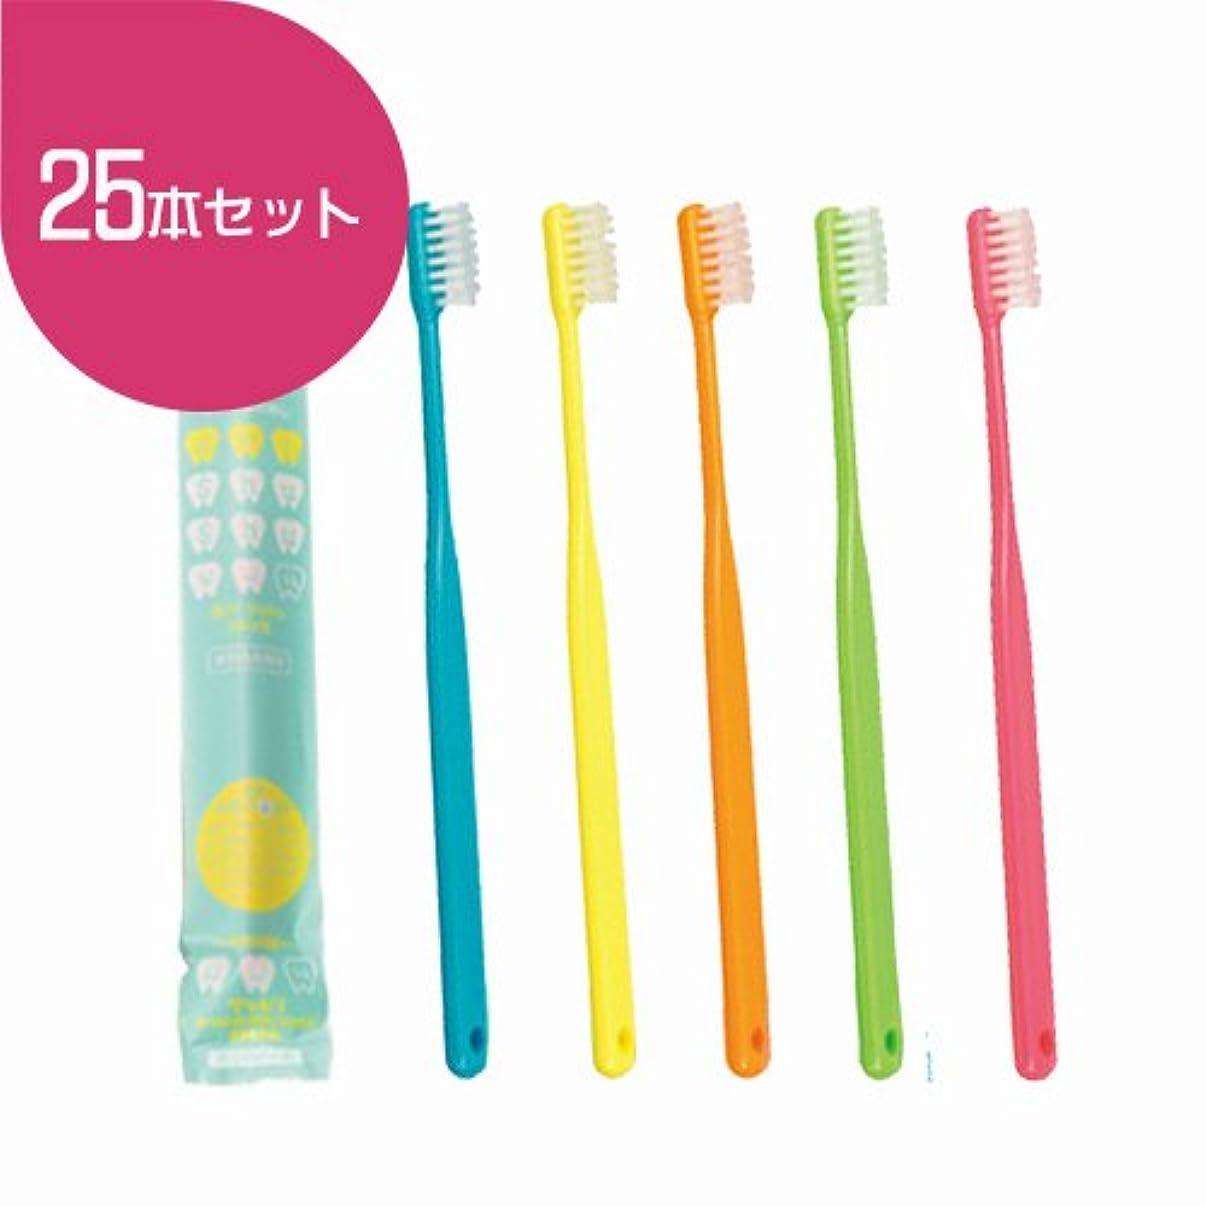 FEED(フィード) 占い!Shu Shu(うらないシュシュ)歯ブラシ×25本 (ふつう(M), 色はおまかせ)